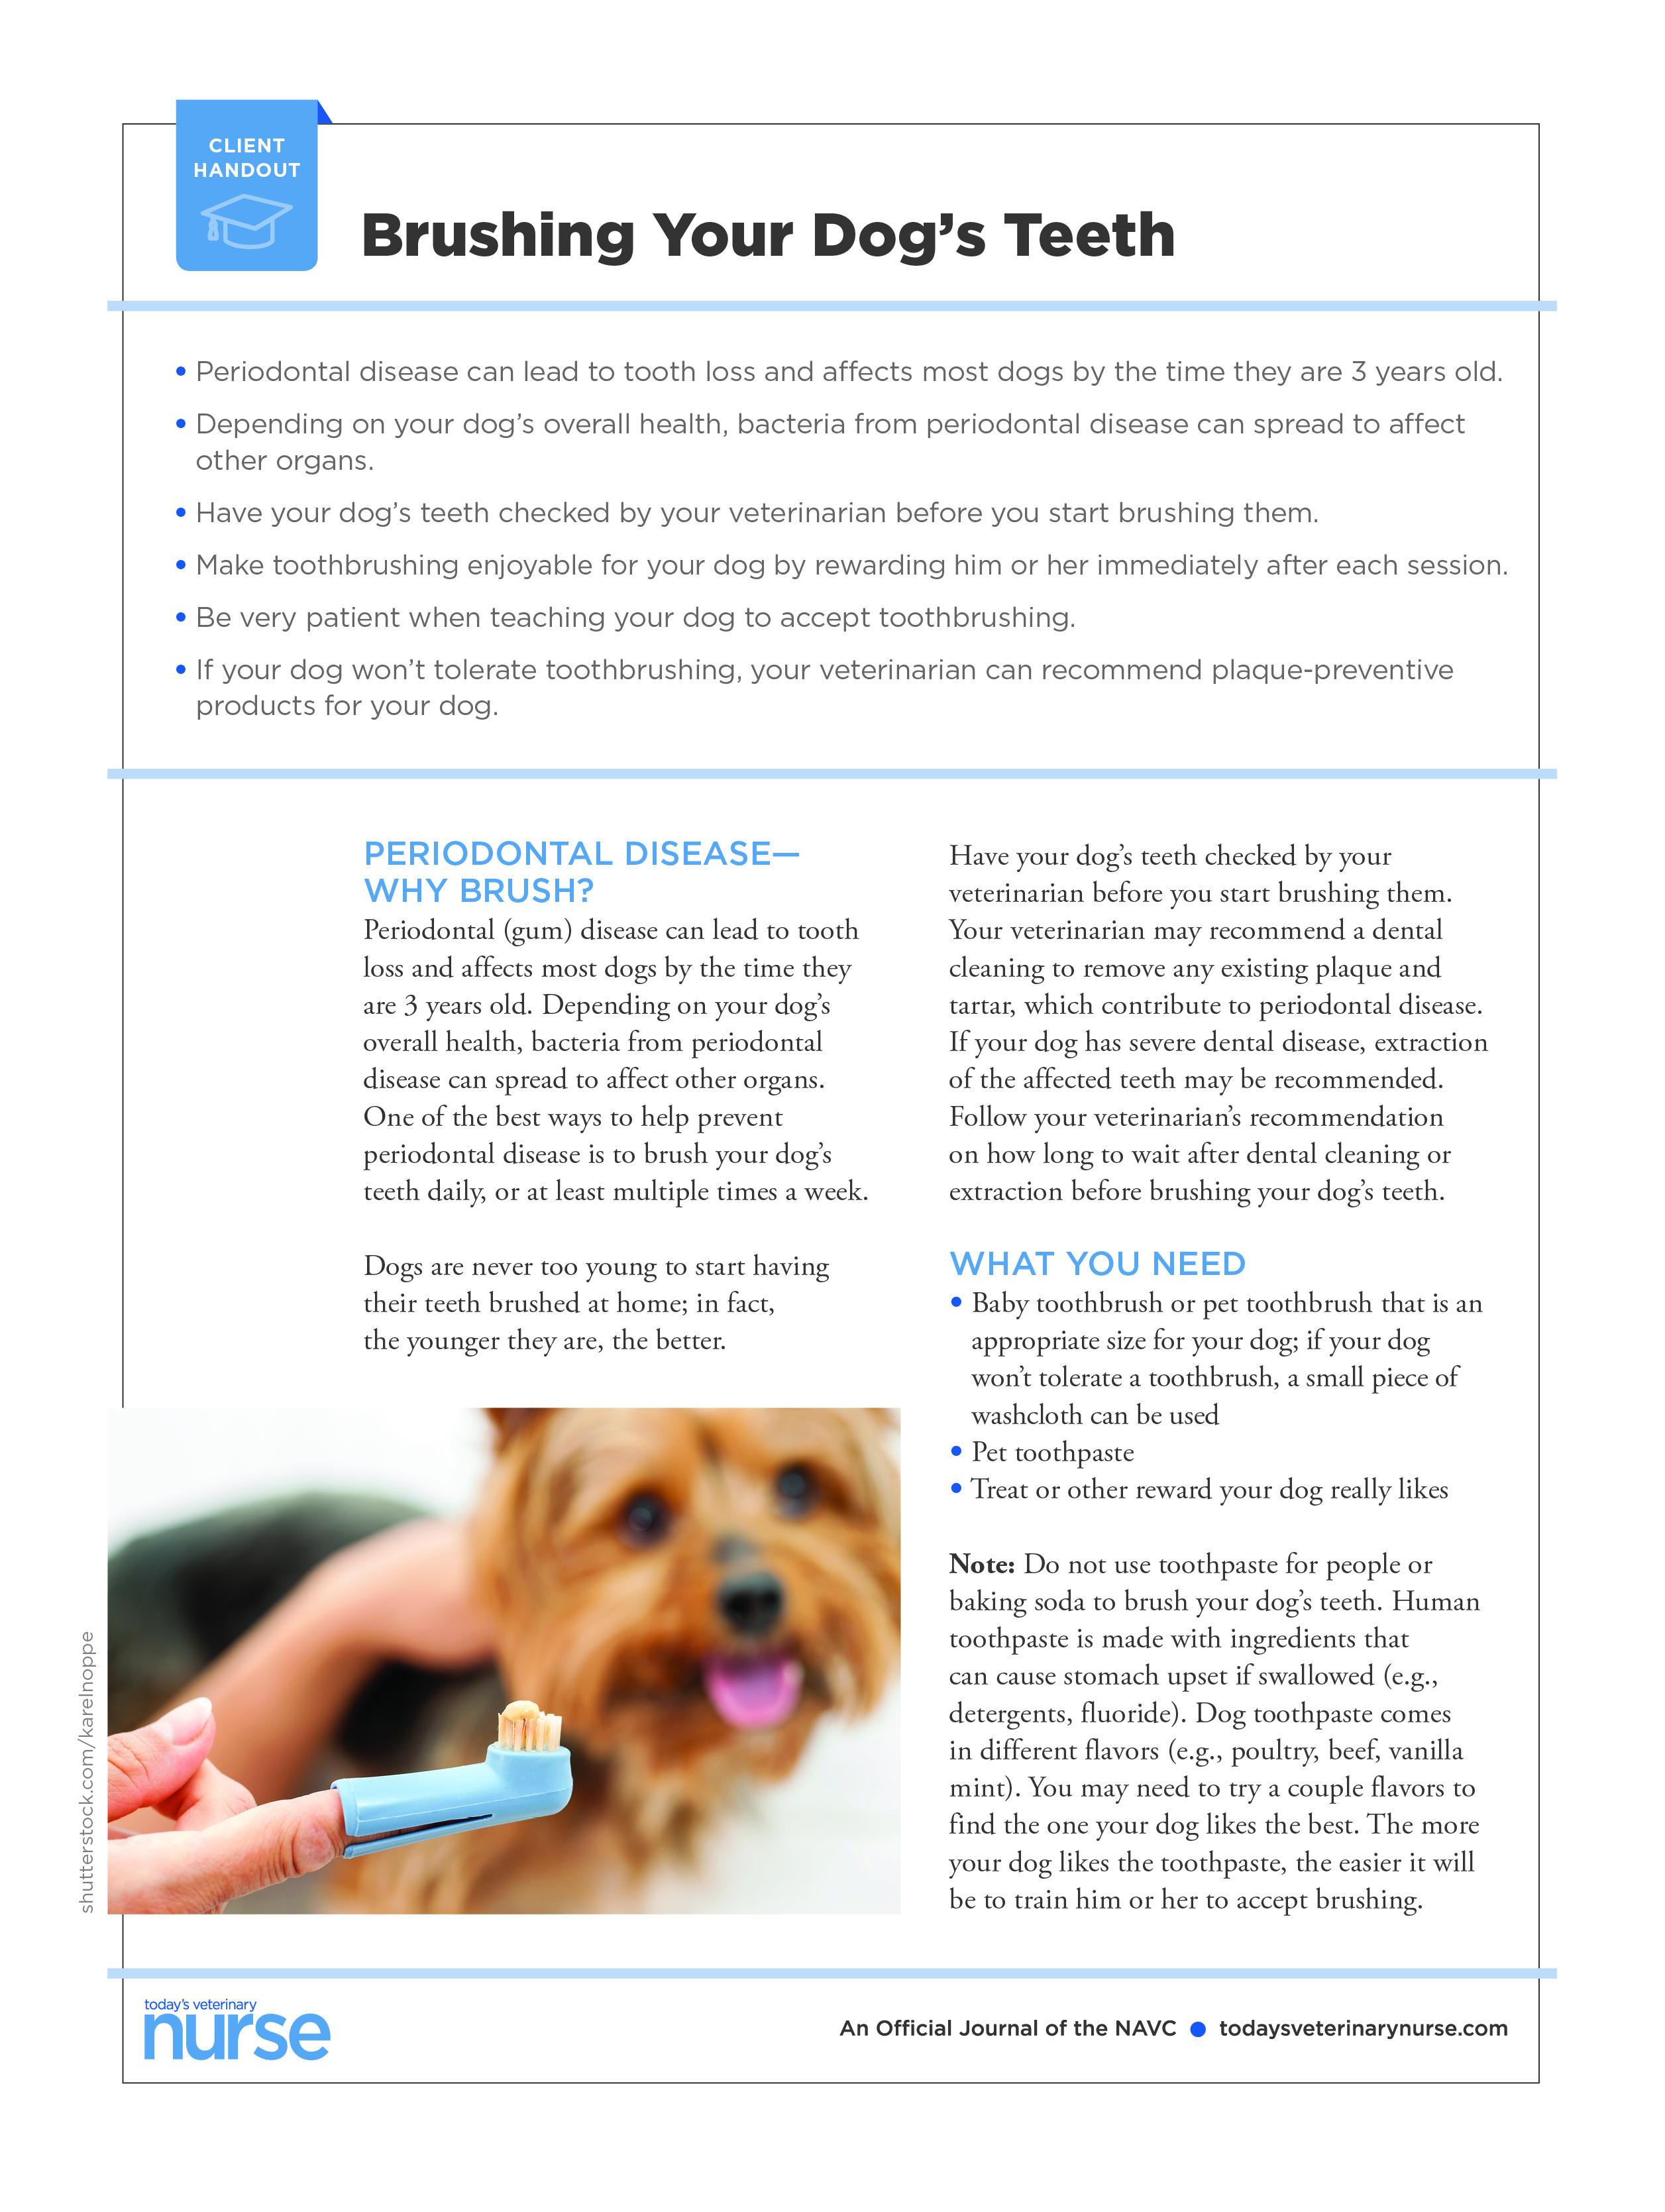 Client Handouts | Today's Veterinary Nurse